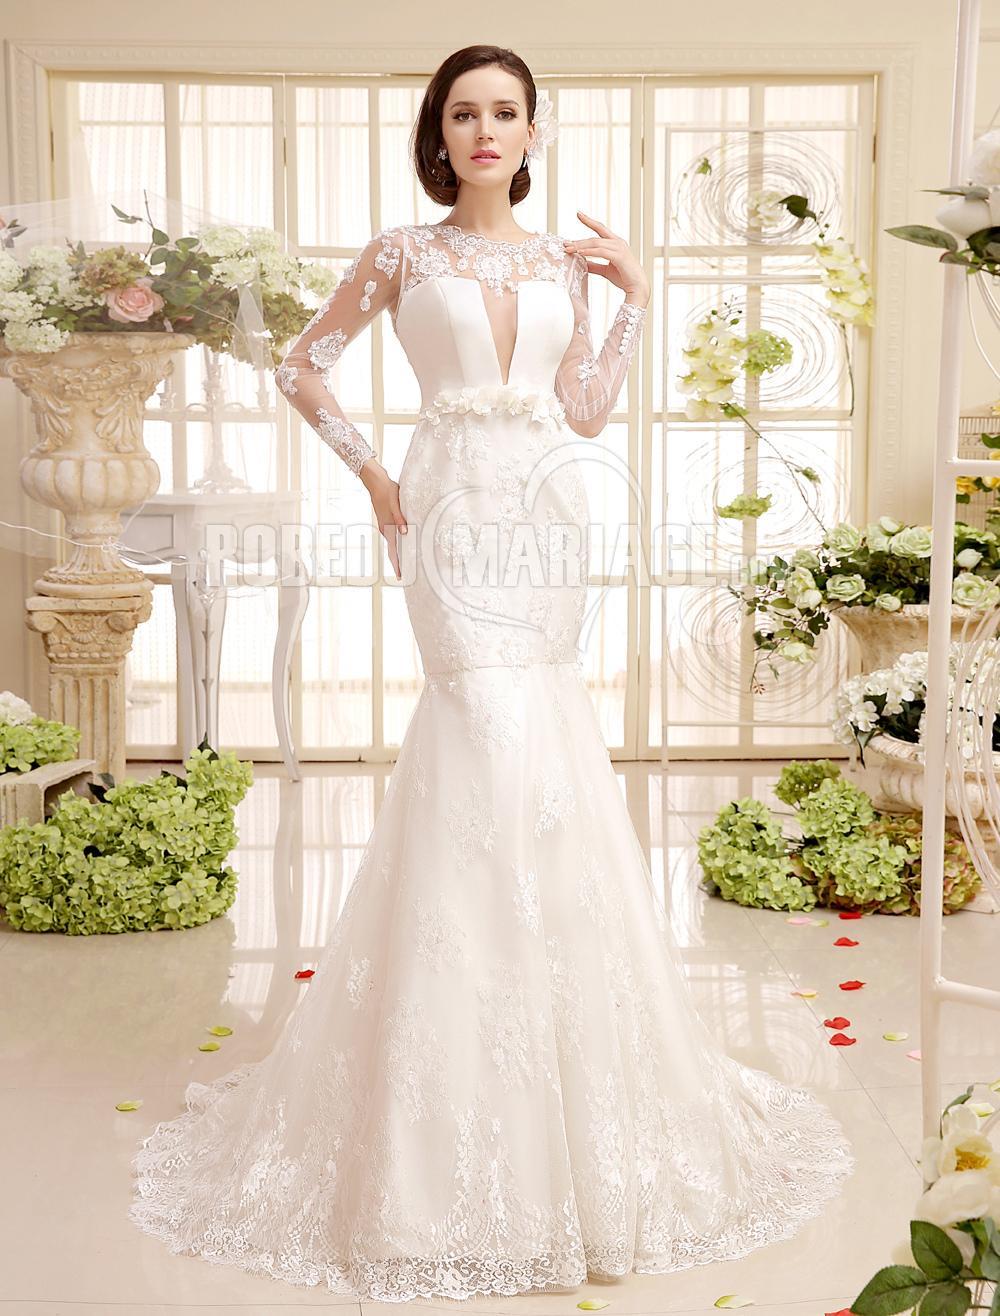 manches longue robe de mari e dentelle satin col haut robe209229. Black Bedroom Furniture Sets. Home Design Ideas